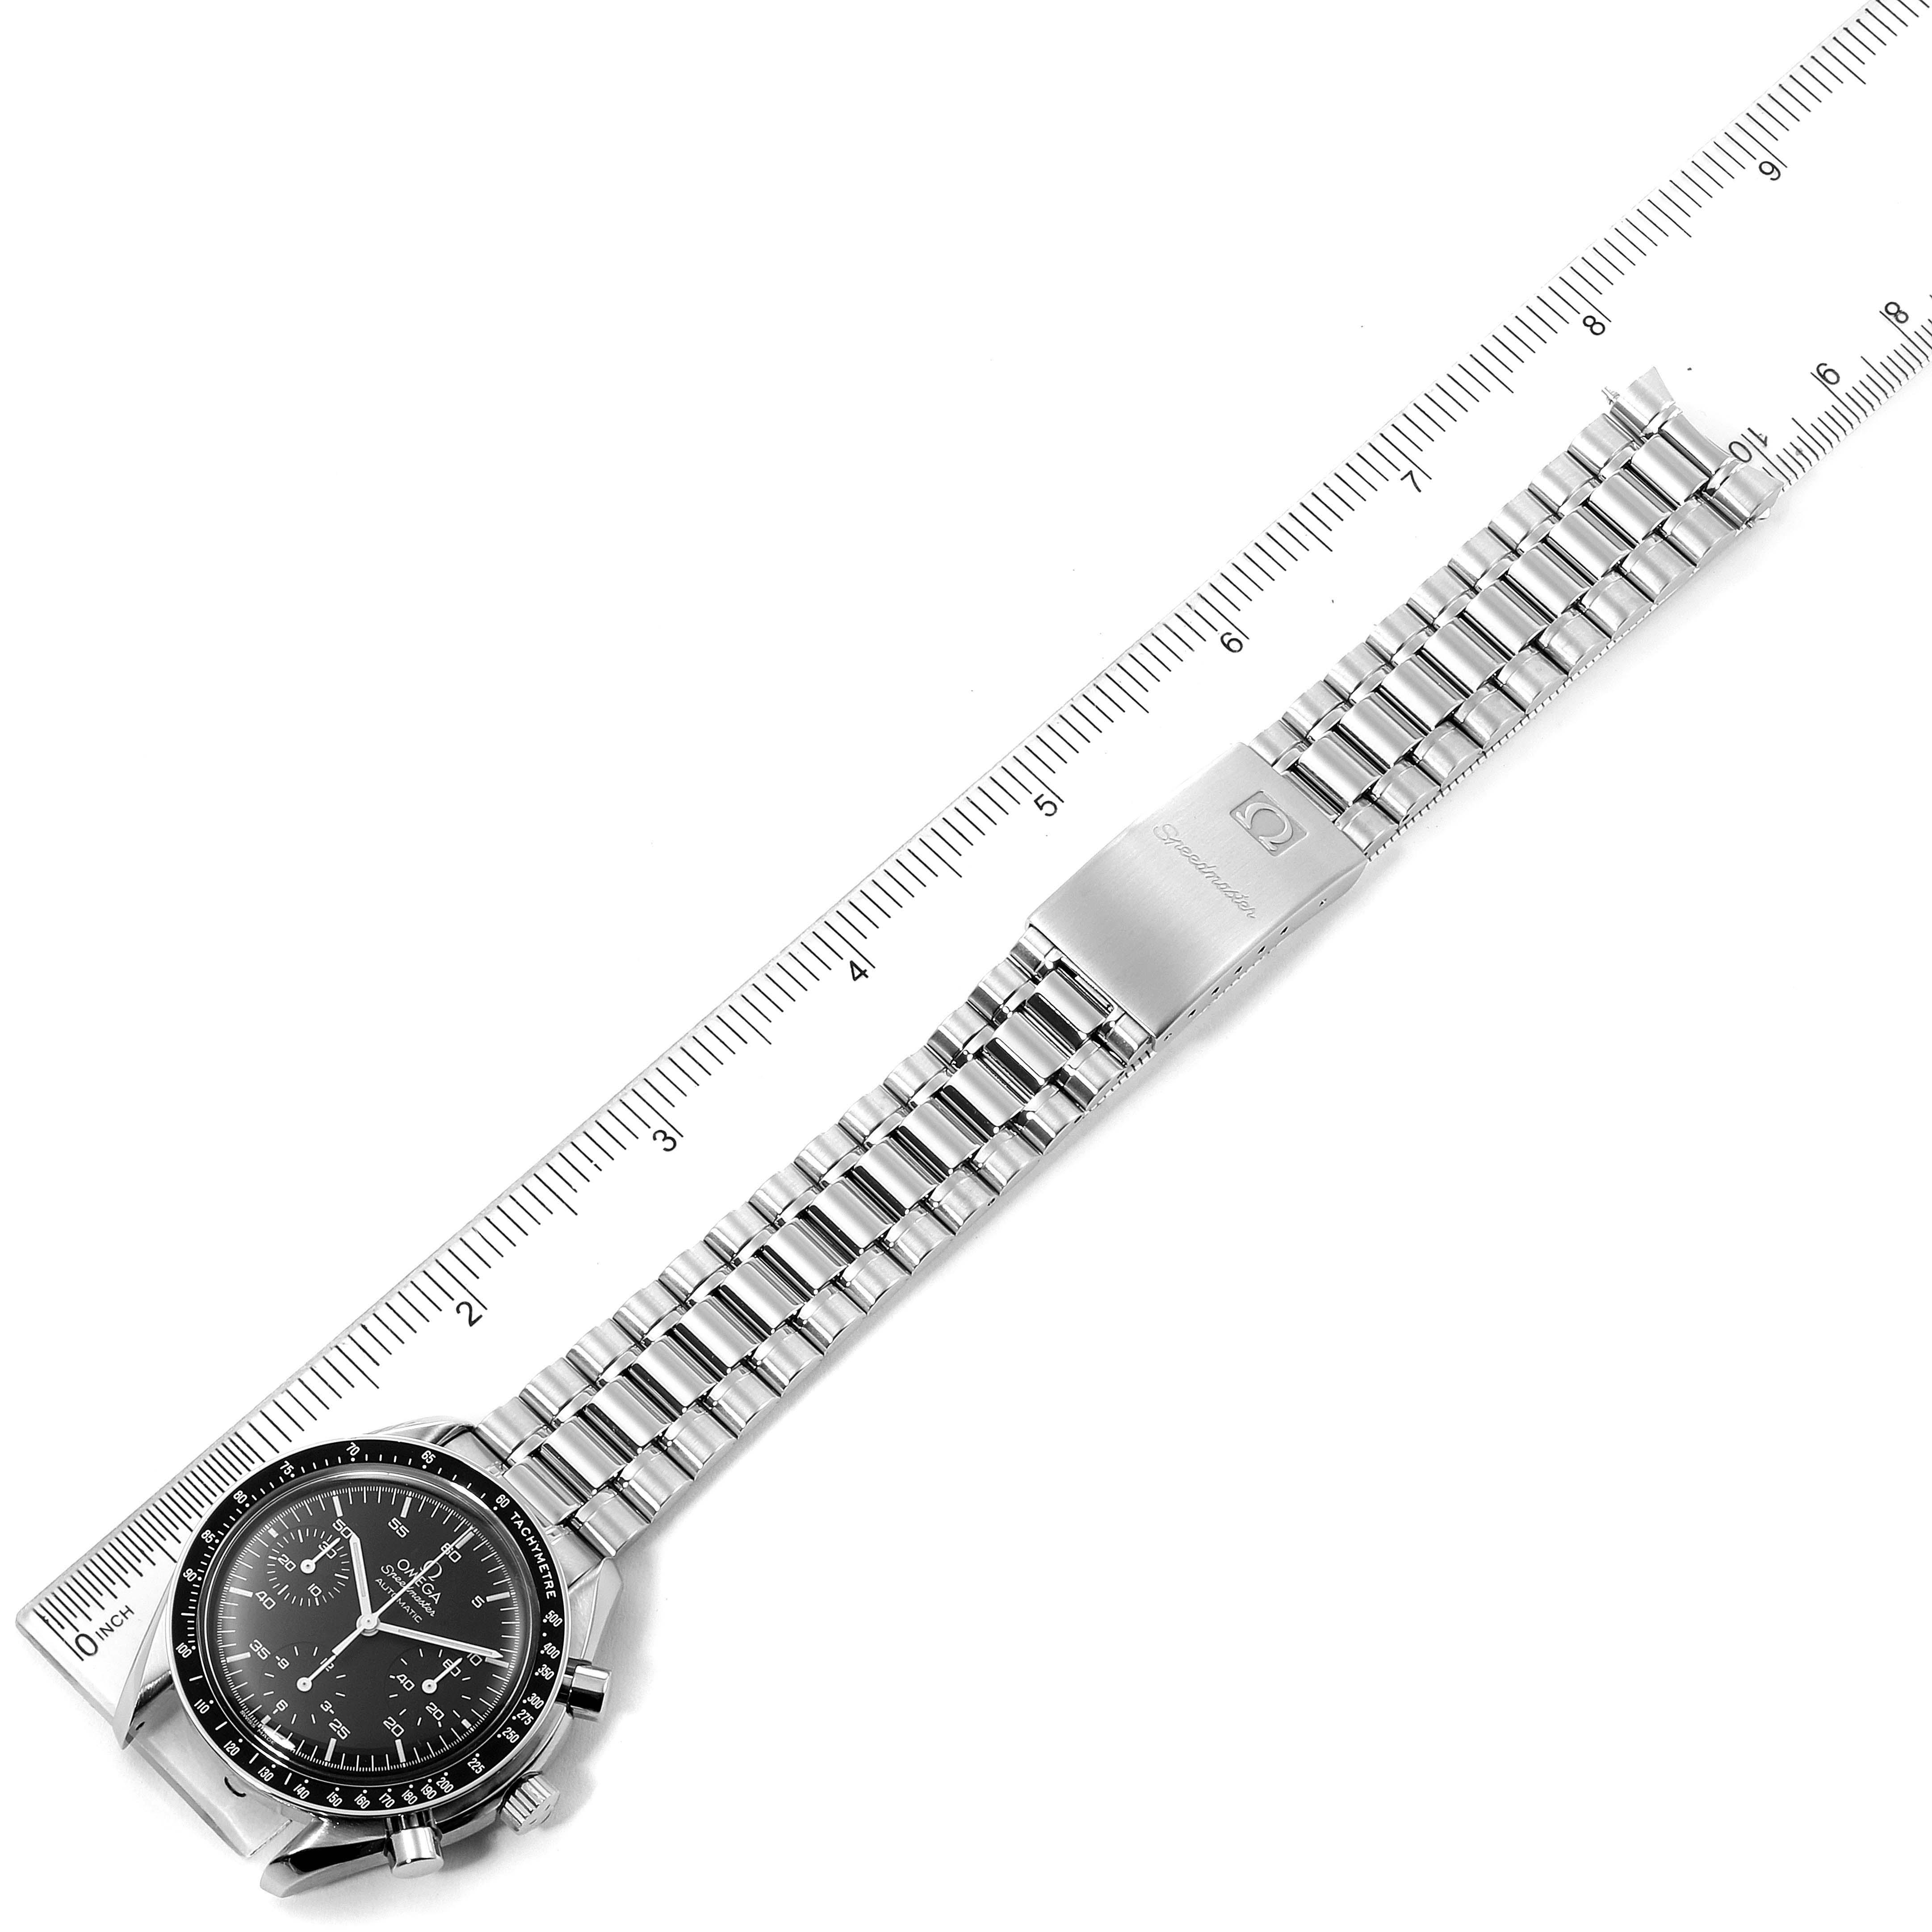 Omega Speedmaster Reduced Hesalite Crystal Automatic Mens Watch 3510.50.00 SwissWatchExpo